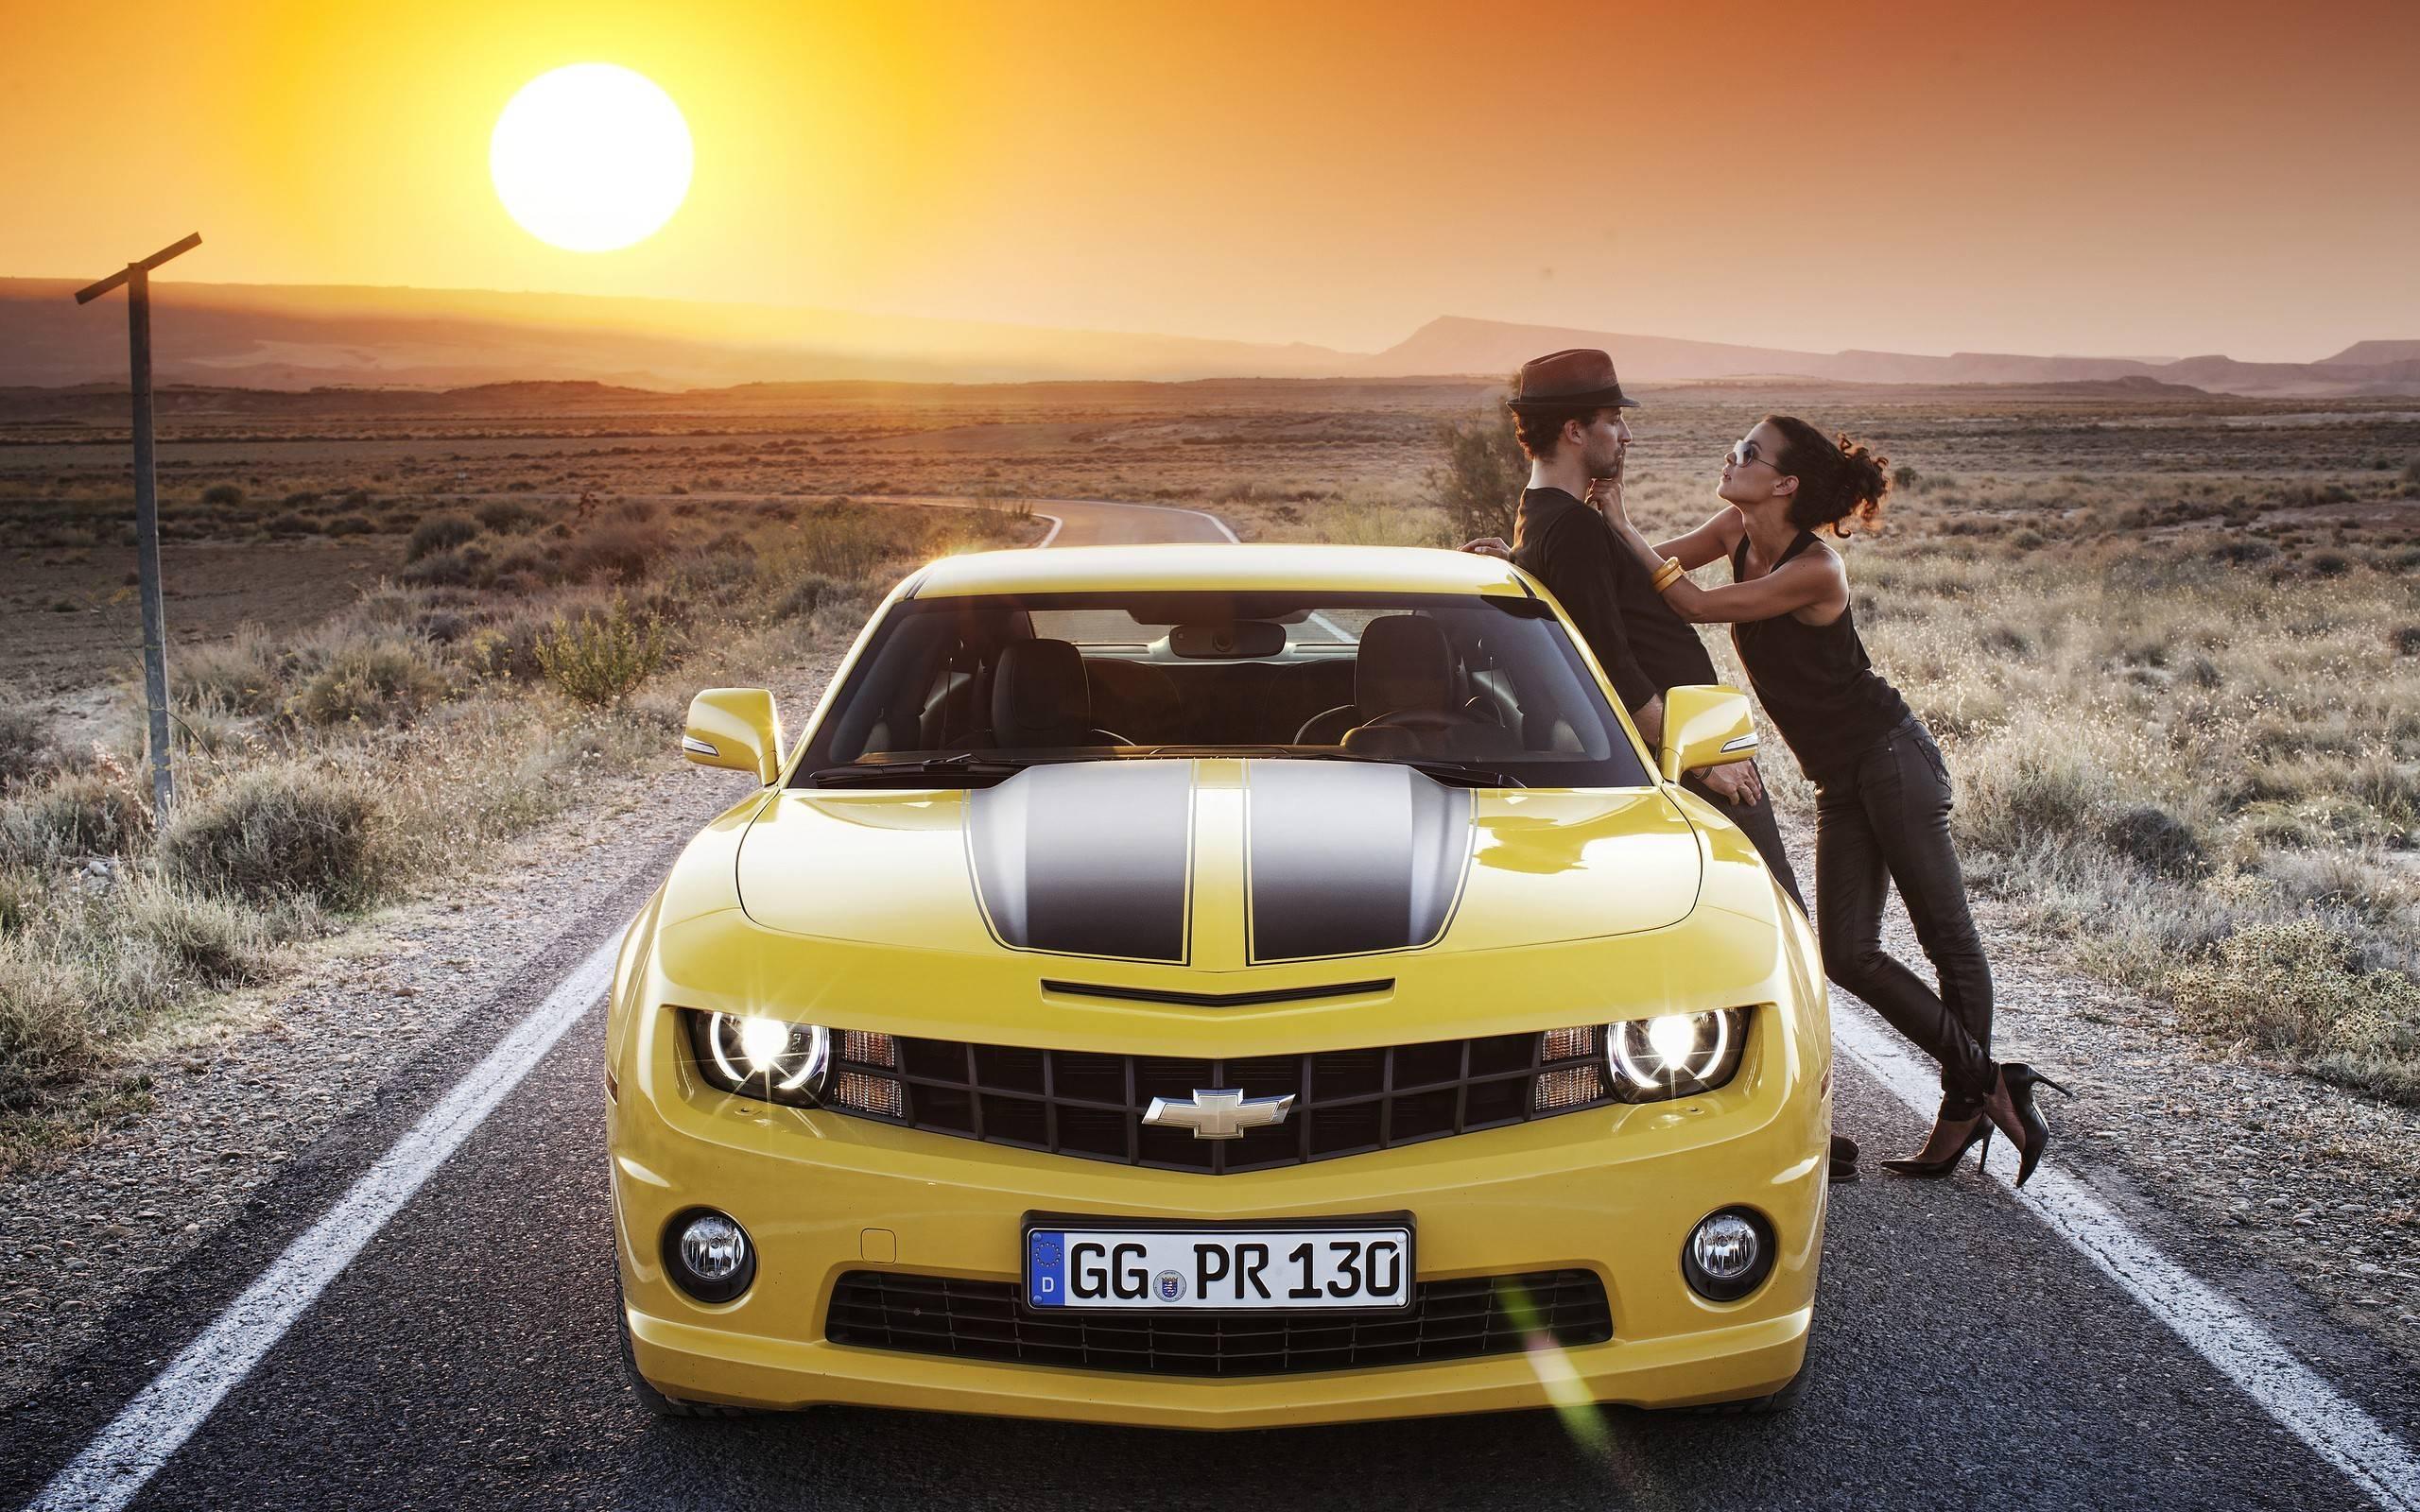 Wallpaper download hd 2017 - 2017 Chevrolet Camaro Zl1 Interior Wallpapers Download Free Hd